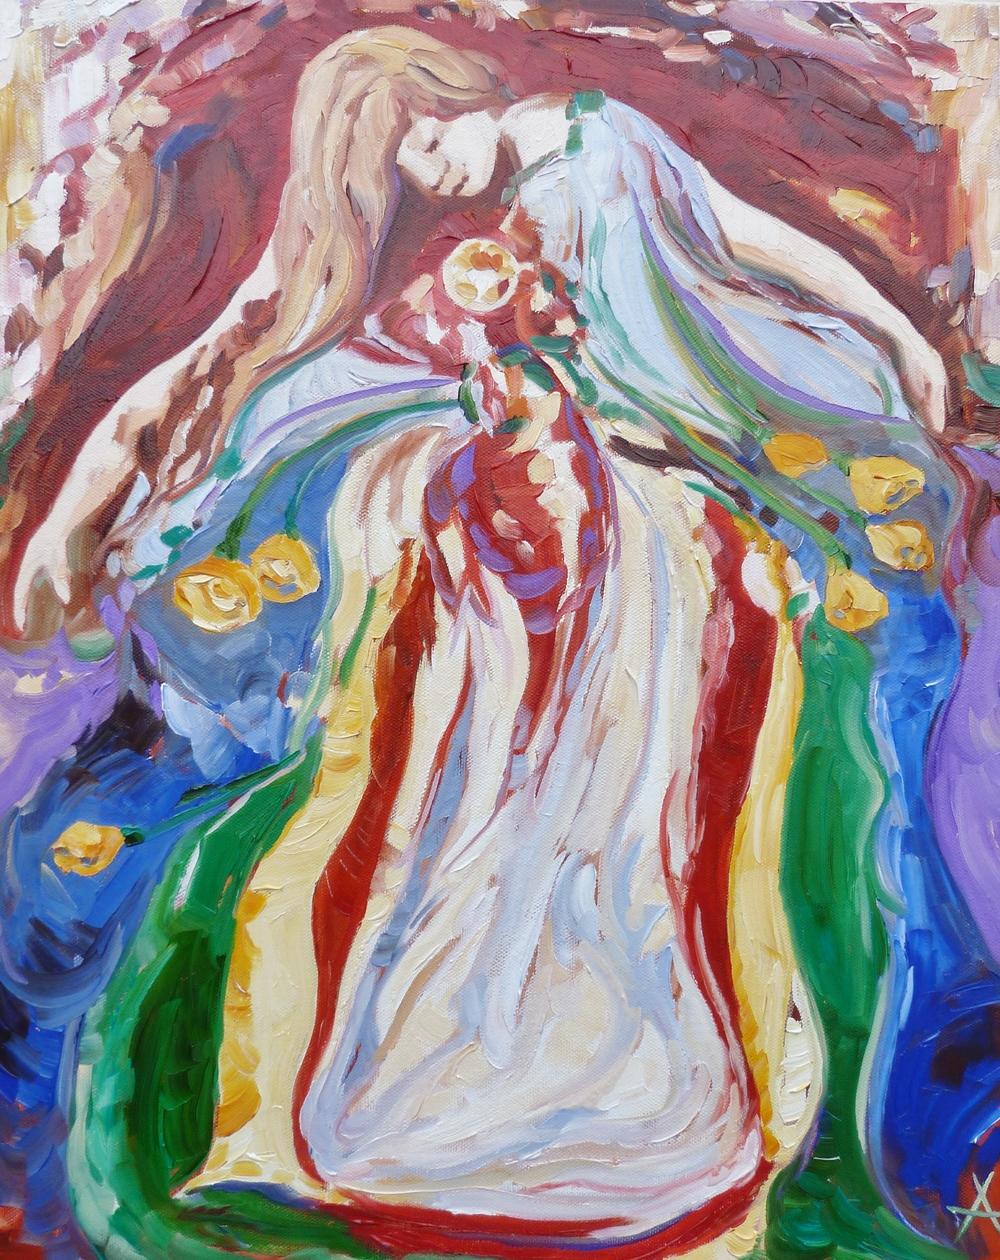 "SOLD, The Goddess Brigid, Copyright 2012 Hirschten, Oil on Canvas, 16"" x 20"""